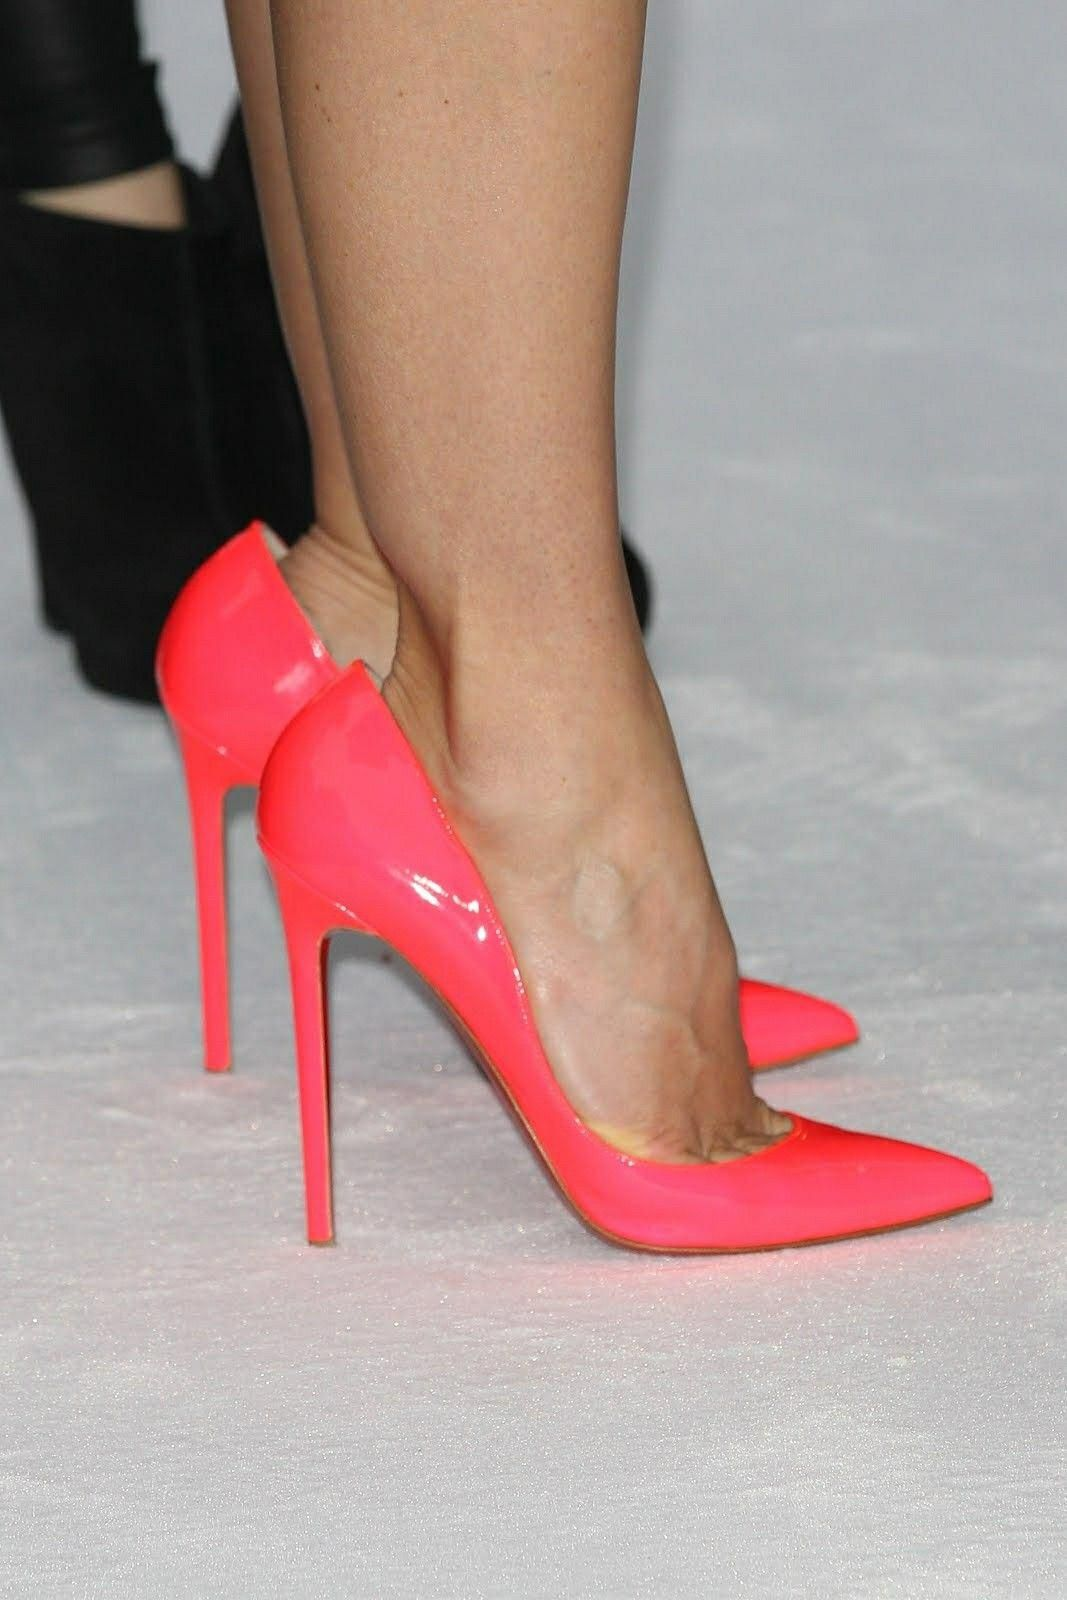 573e7ecbedc4 Jessica Biel  orange pumps and toe cleavage  ChristianLouboutin ...